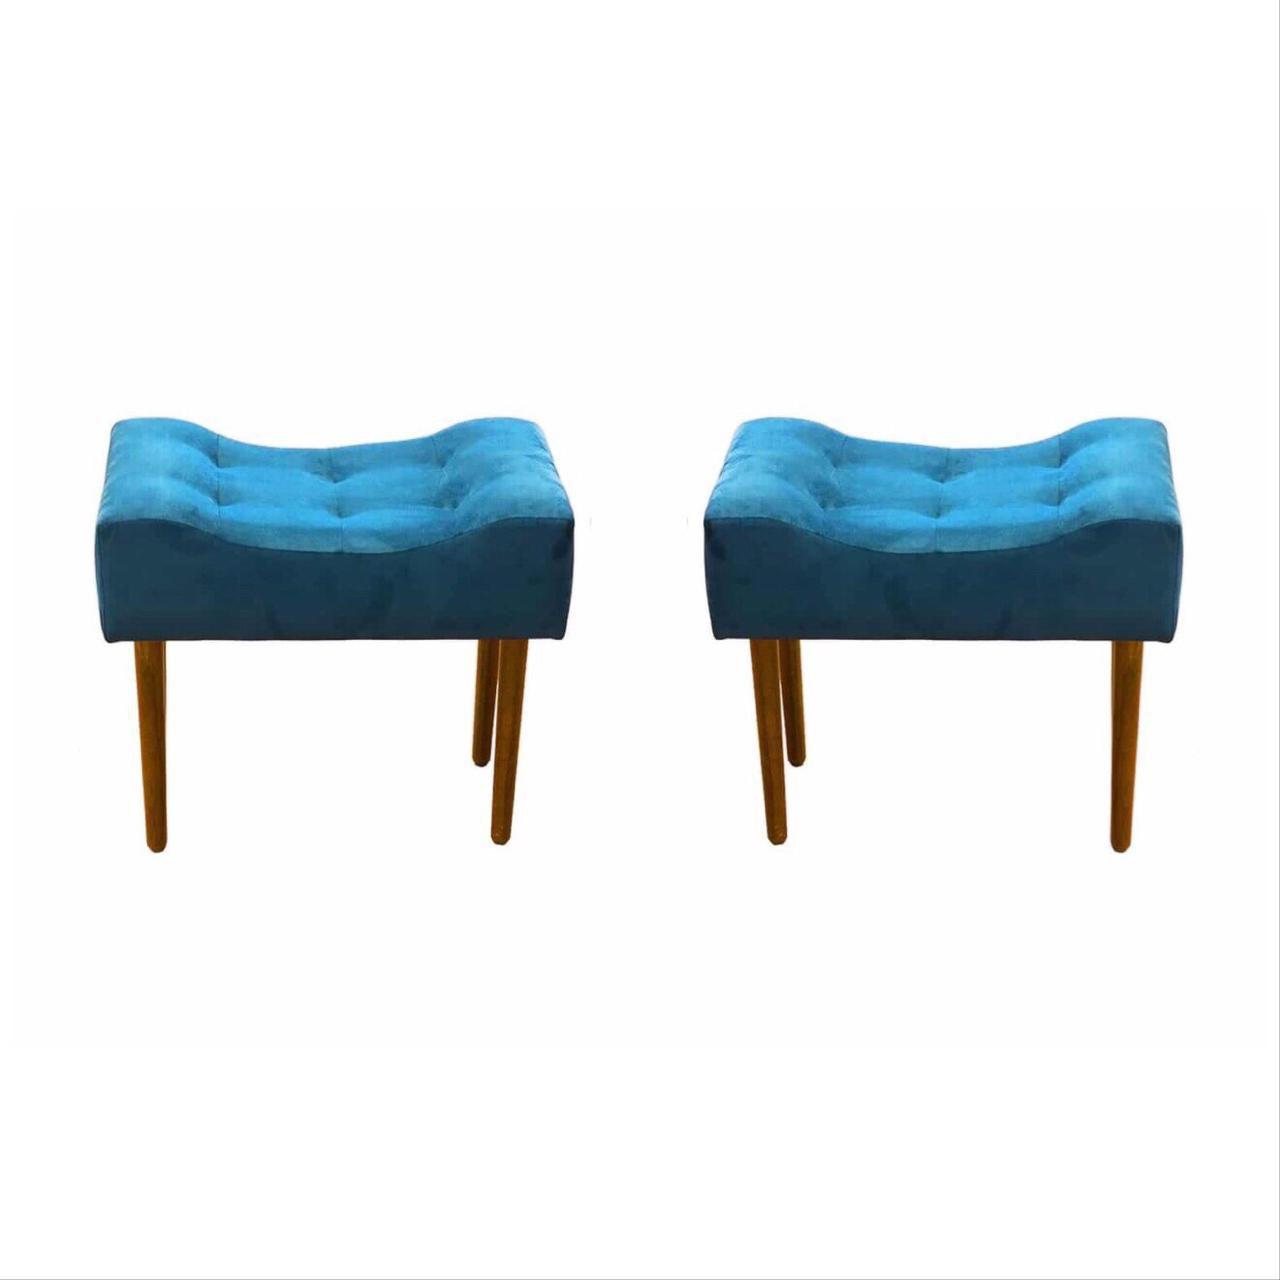 Kit 02 Puff Decorativo Retangular com pés madeira Azul